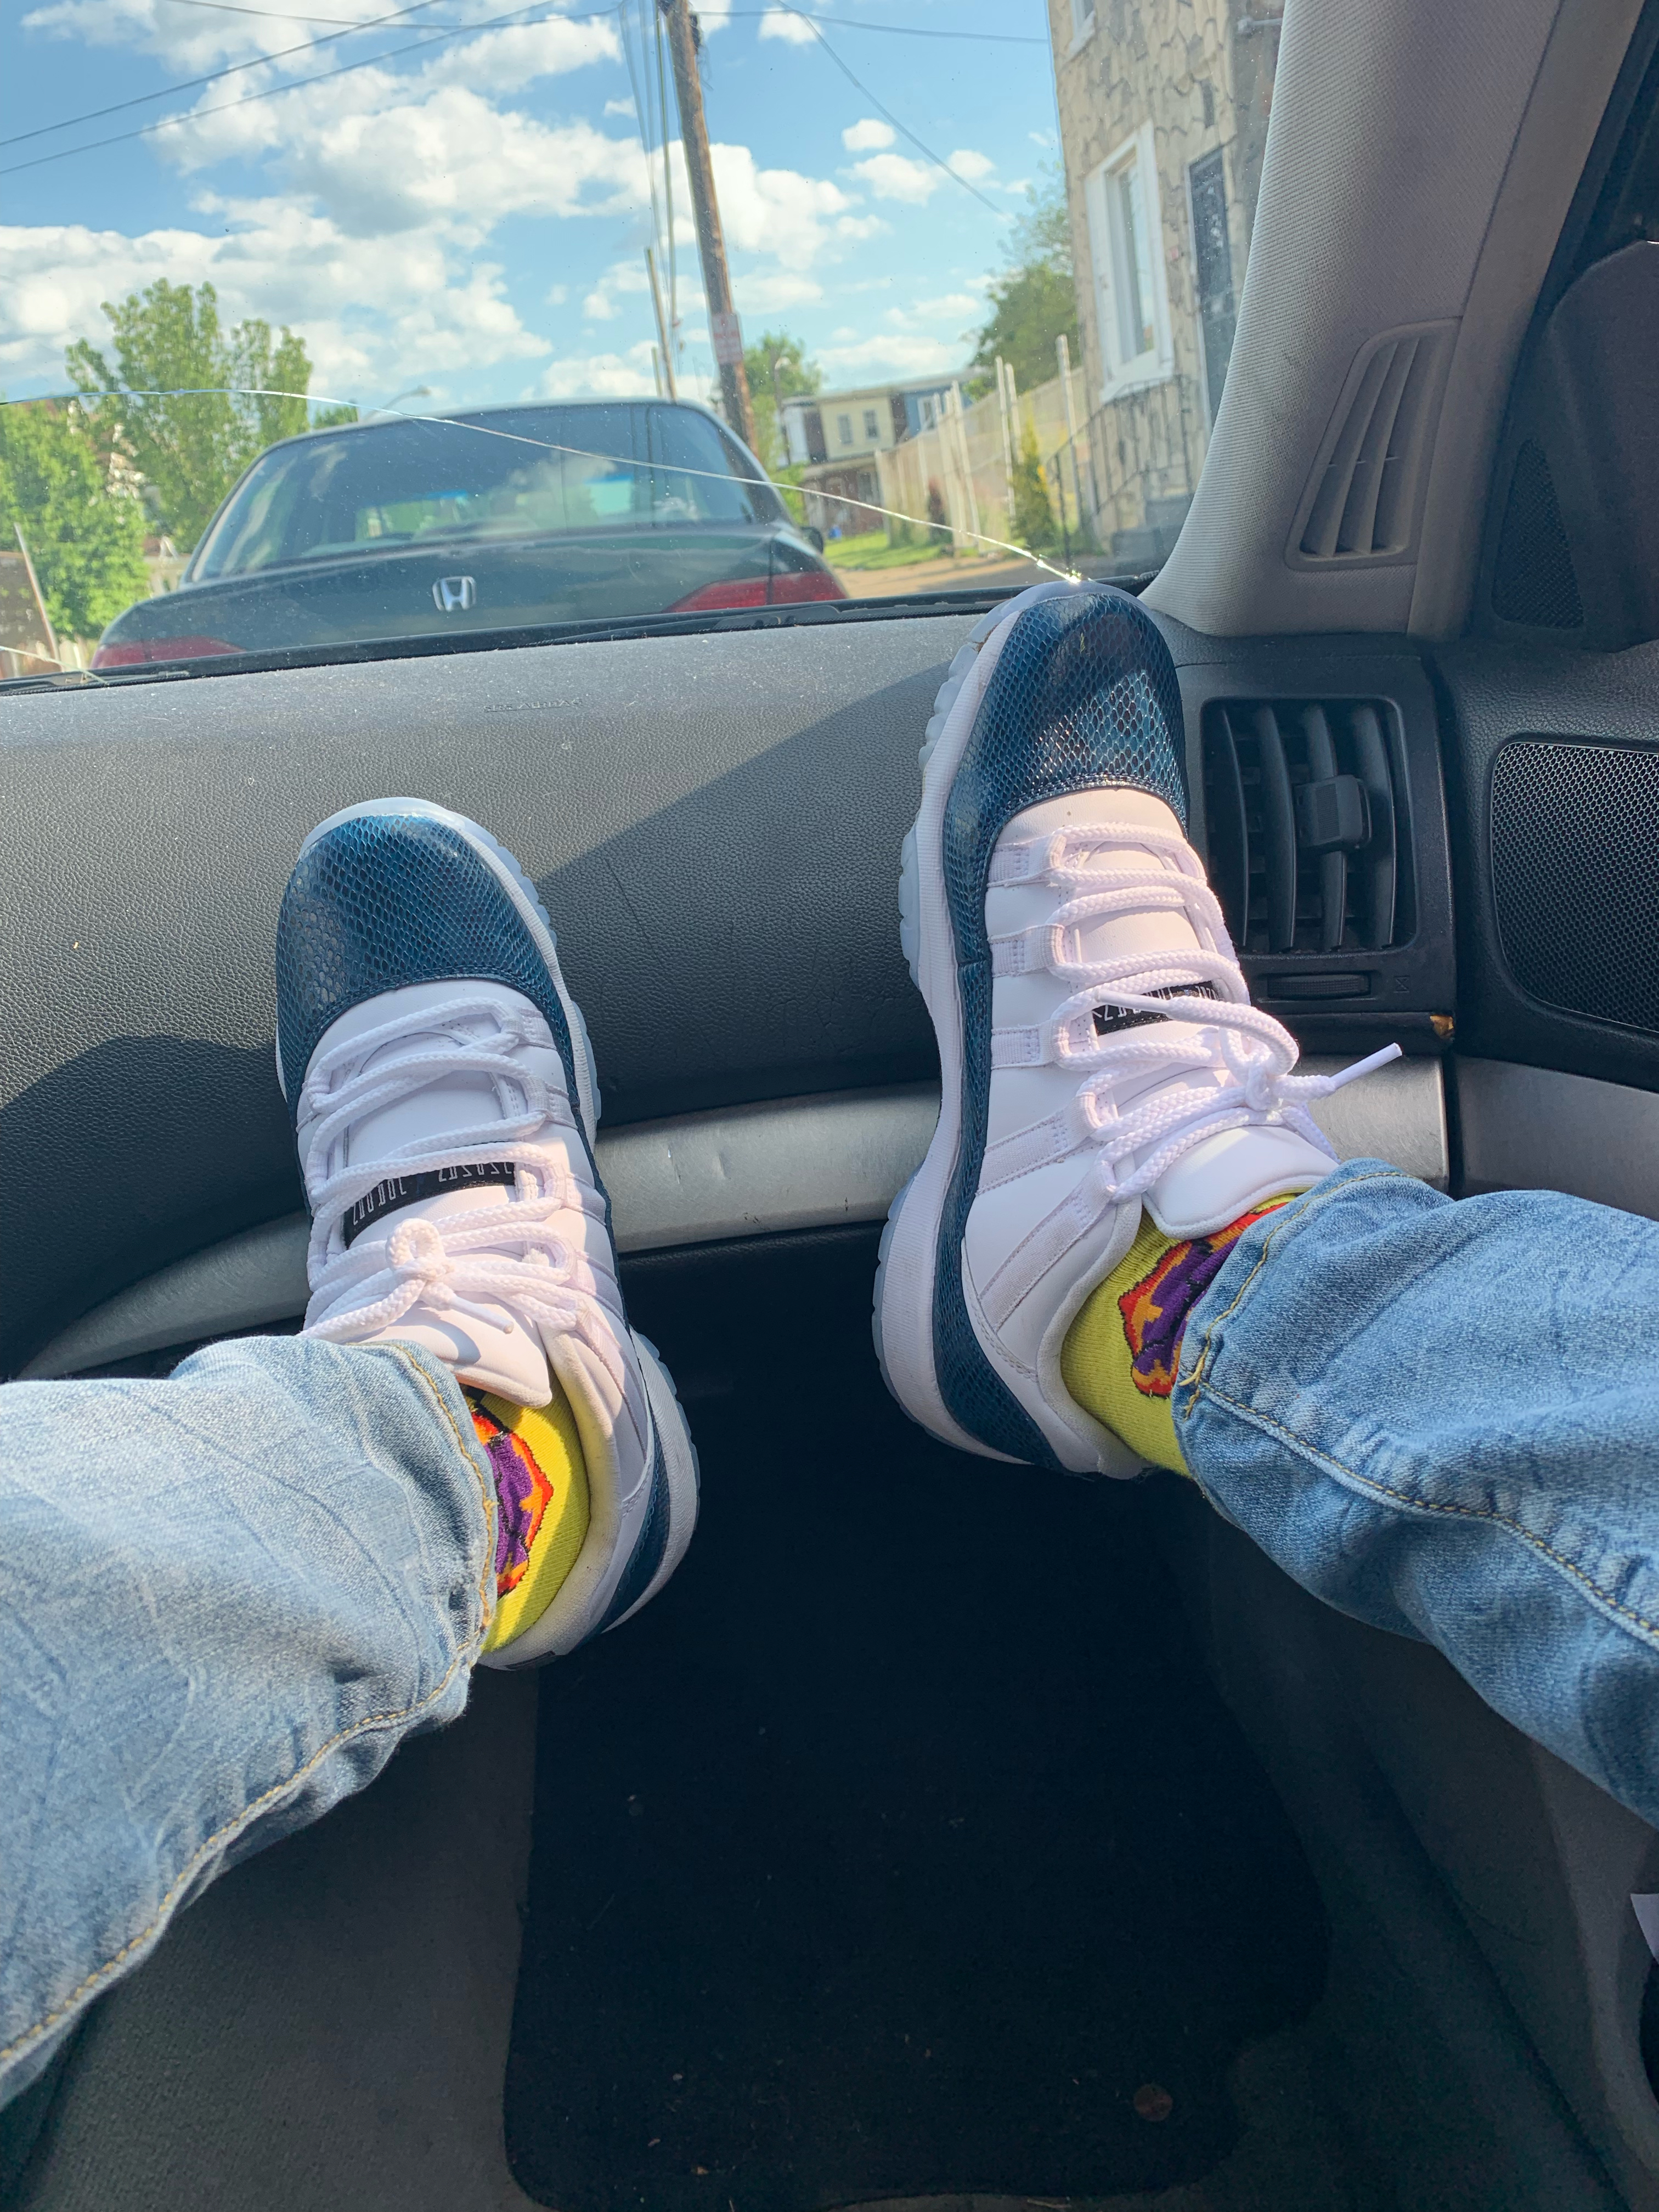 Air Jordan 11 Low Blue Snakeskin